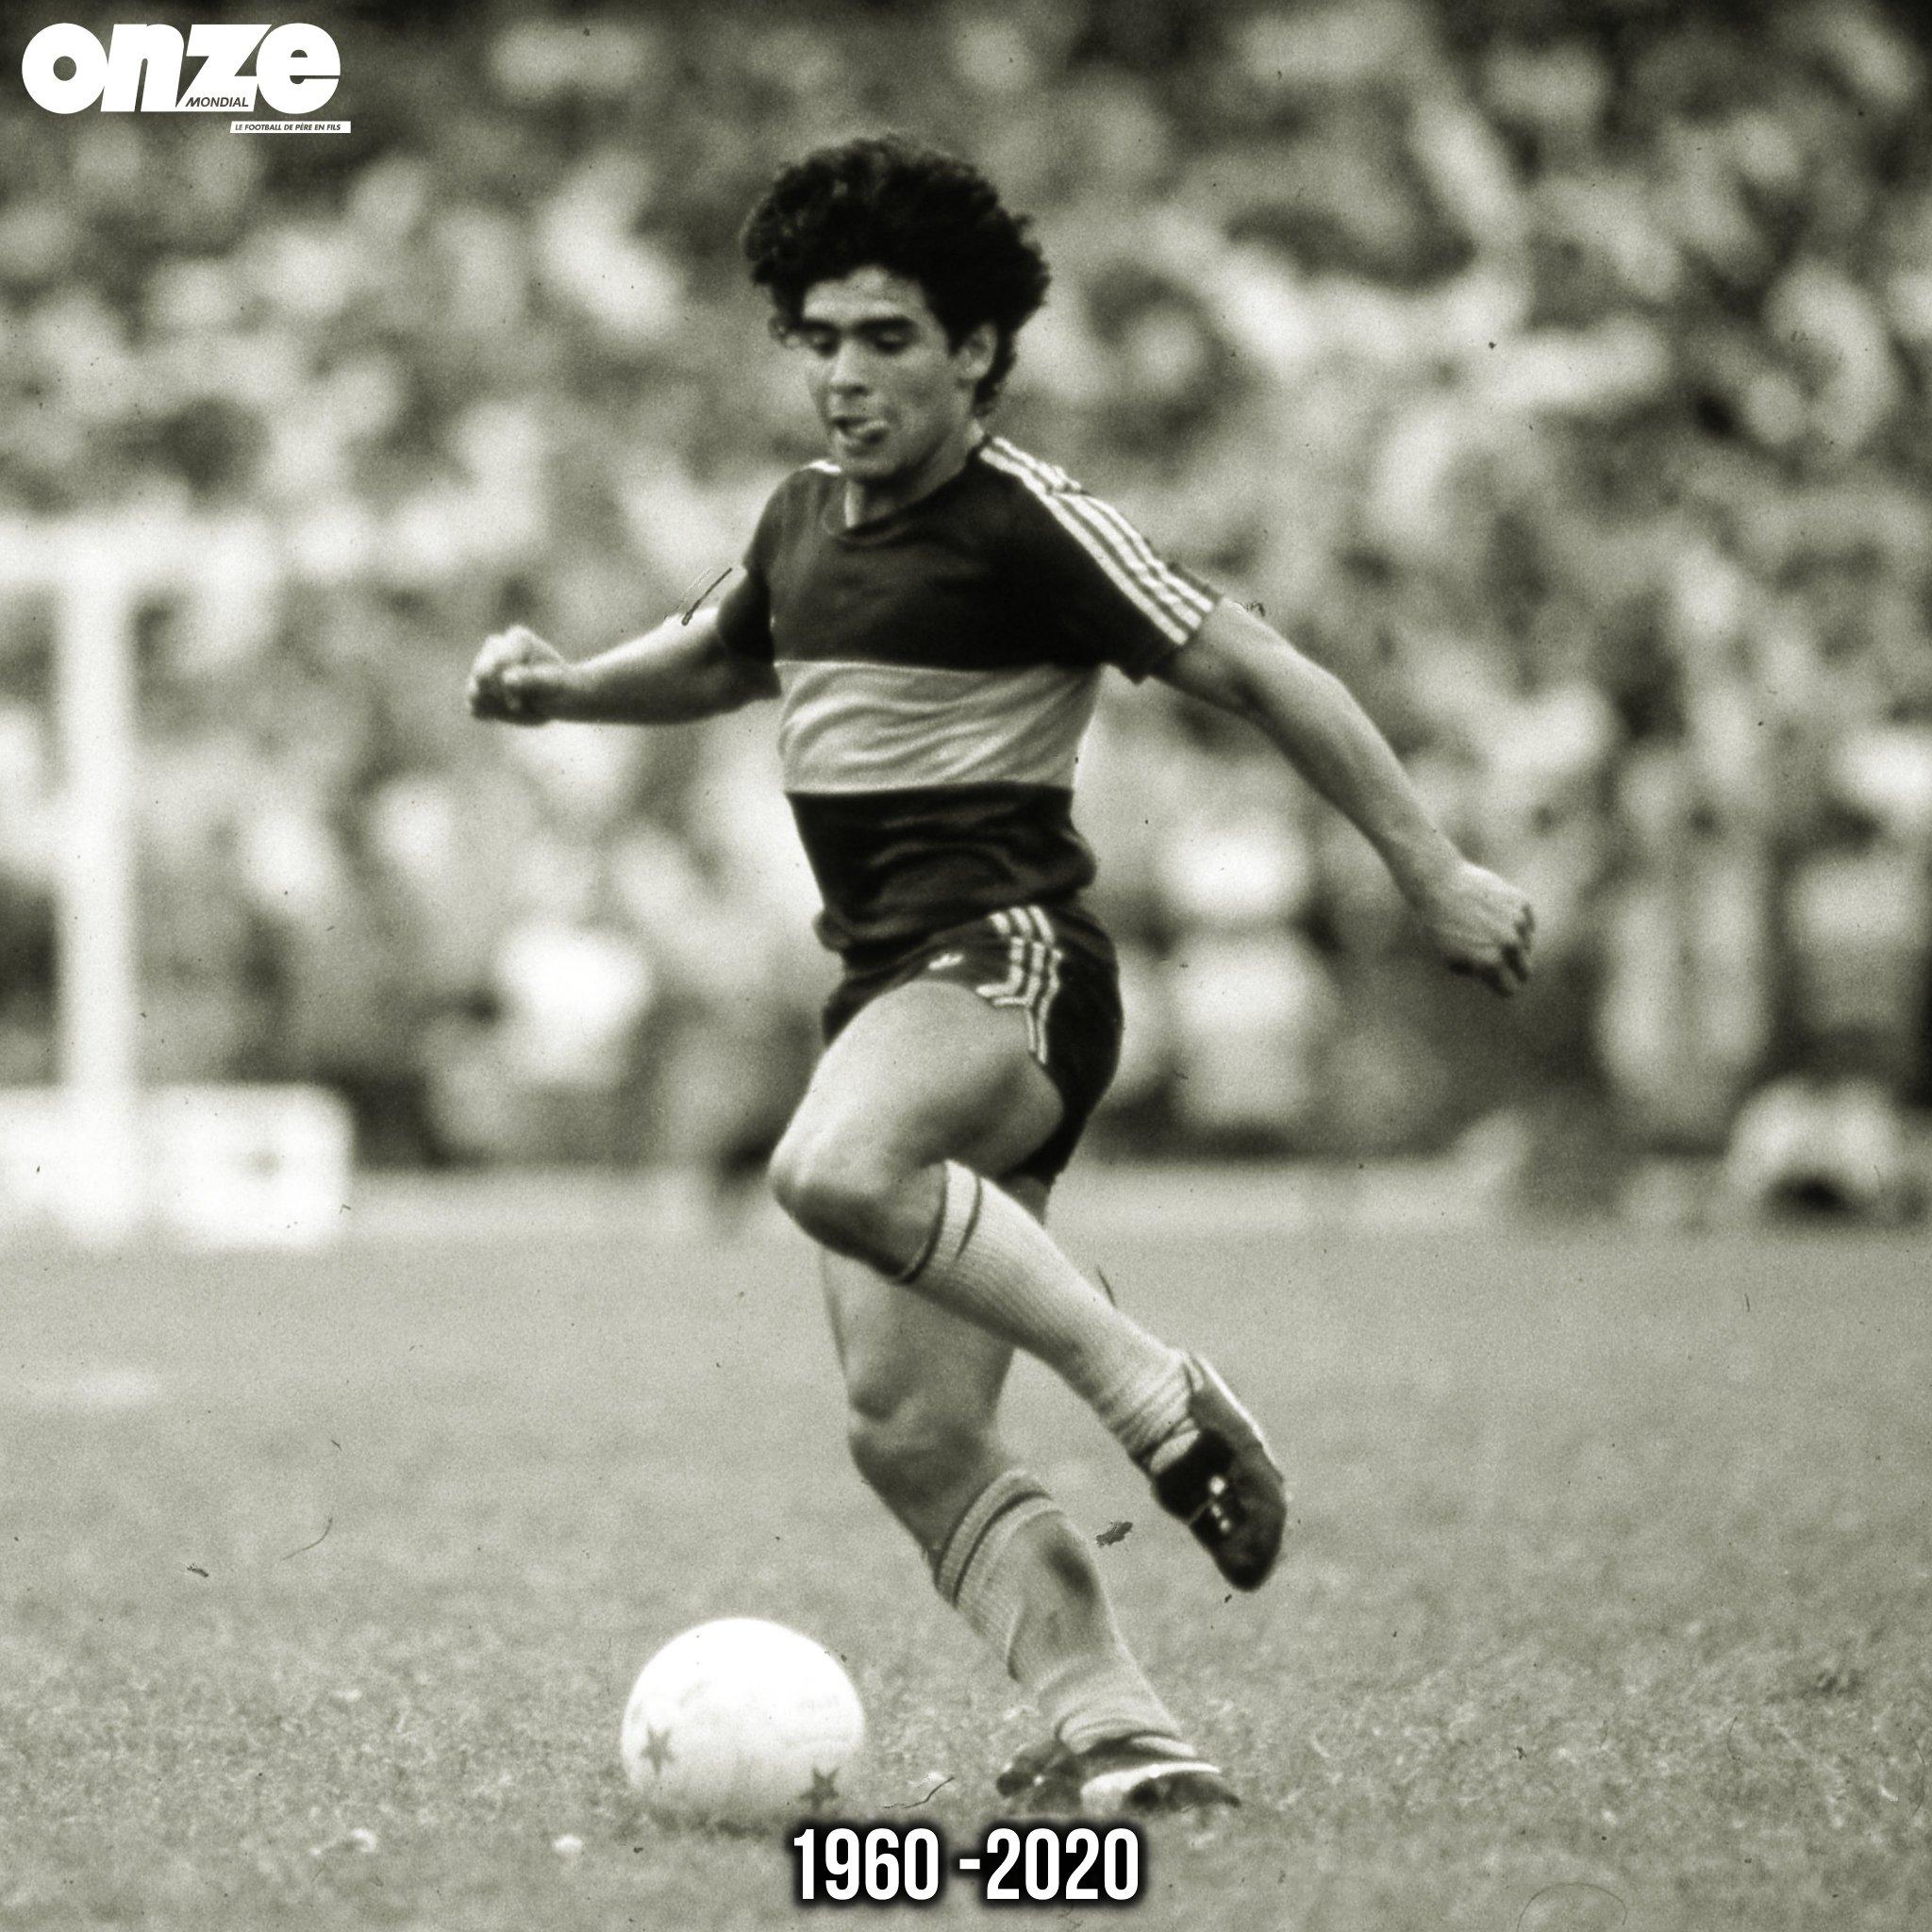 La légende du football Maradona n'est plus